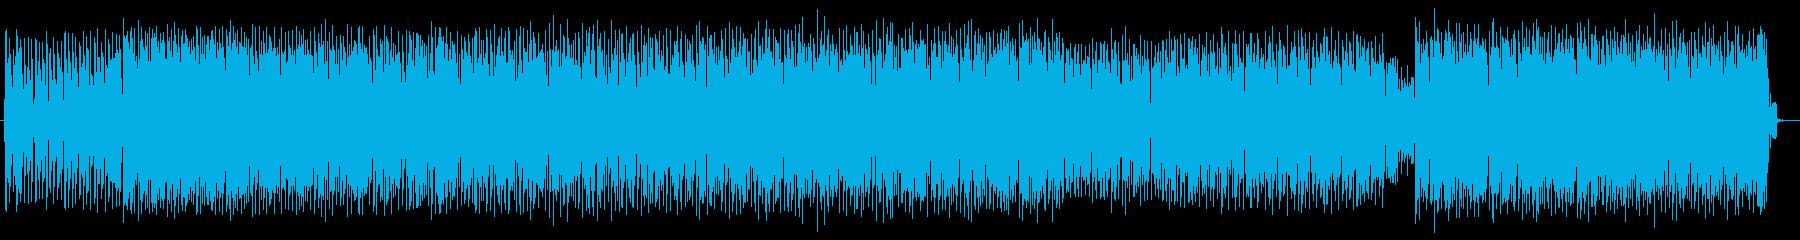 DJボイス入りダンスナンバーの再生済みの波形